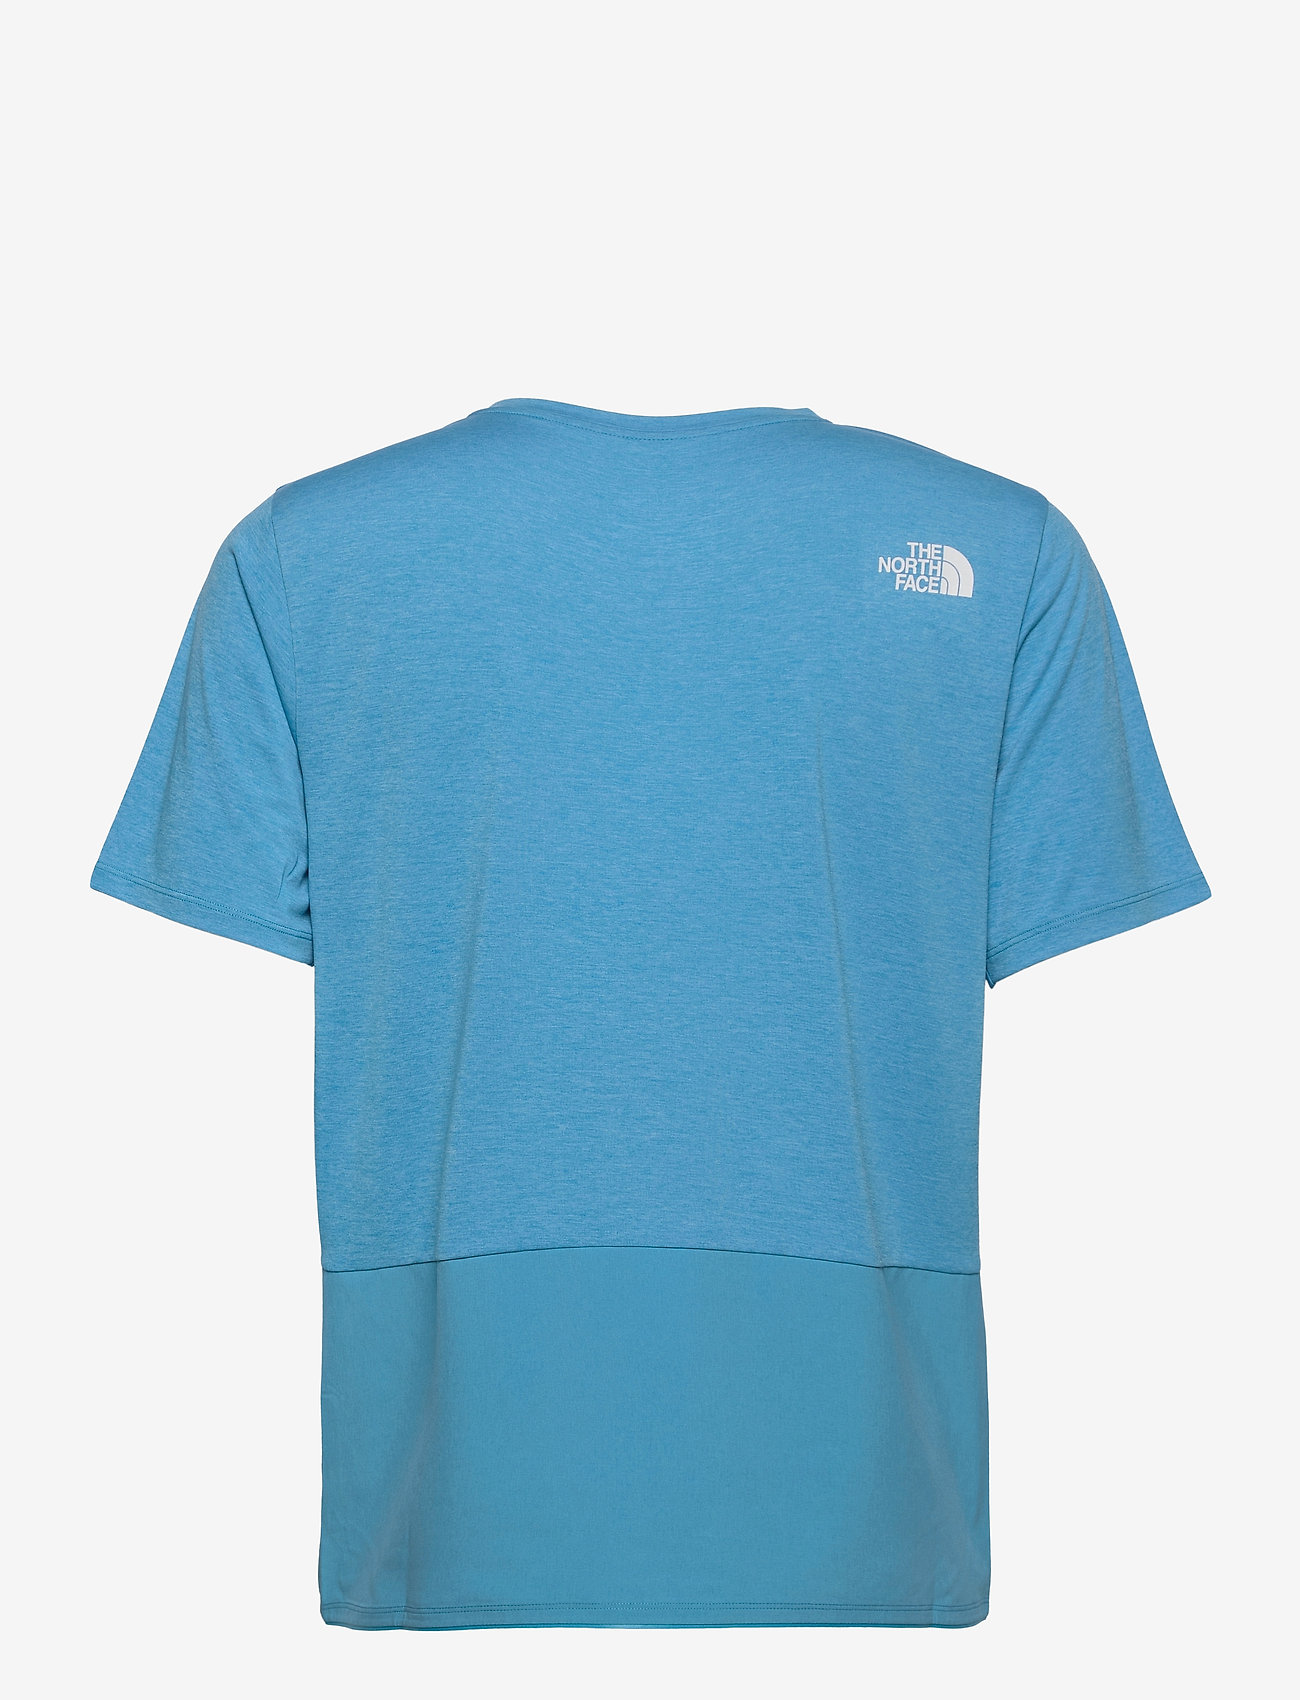 The North Face - M BRIDGER S/S - t-shirts - meridian blue heather - 1